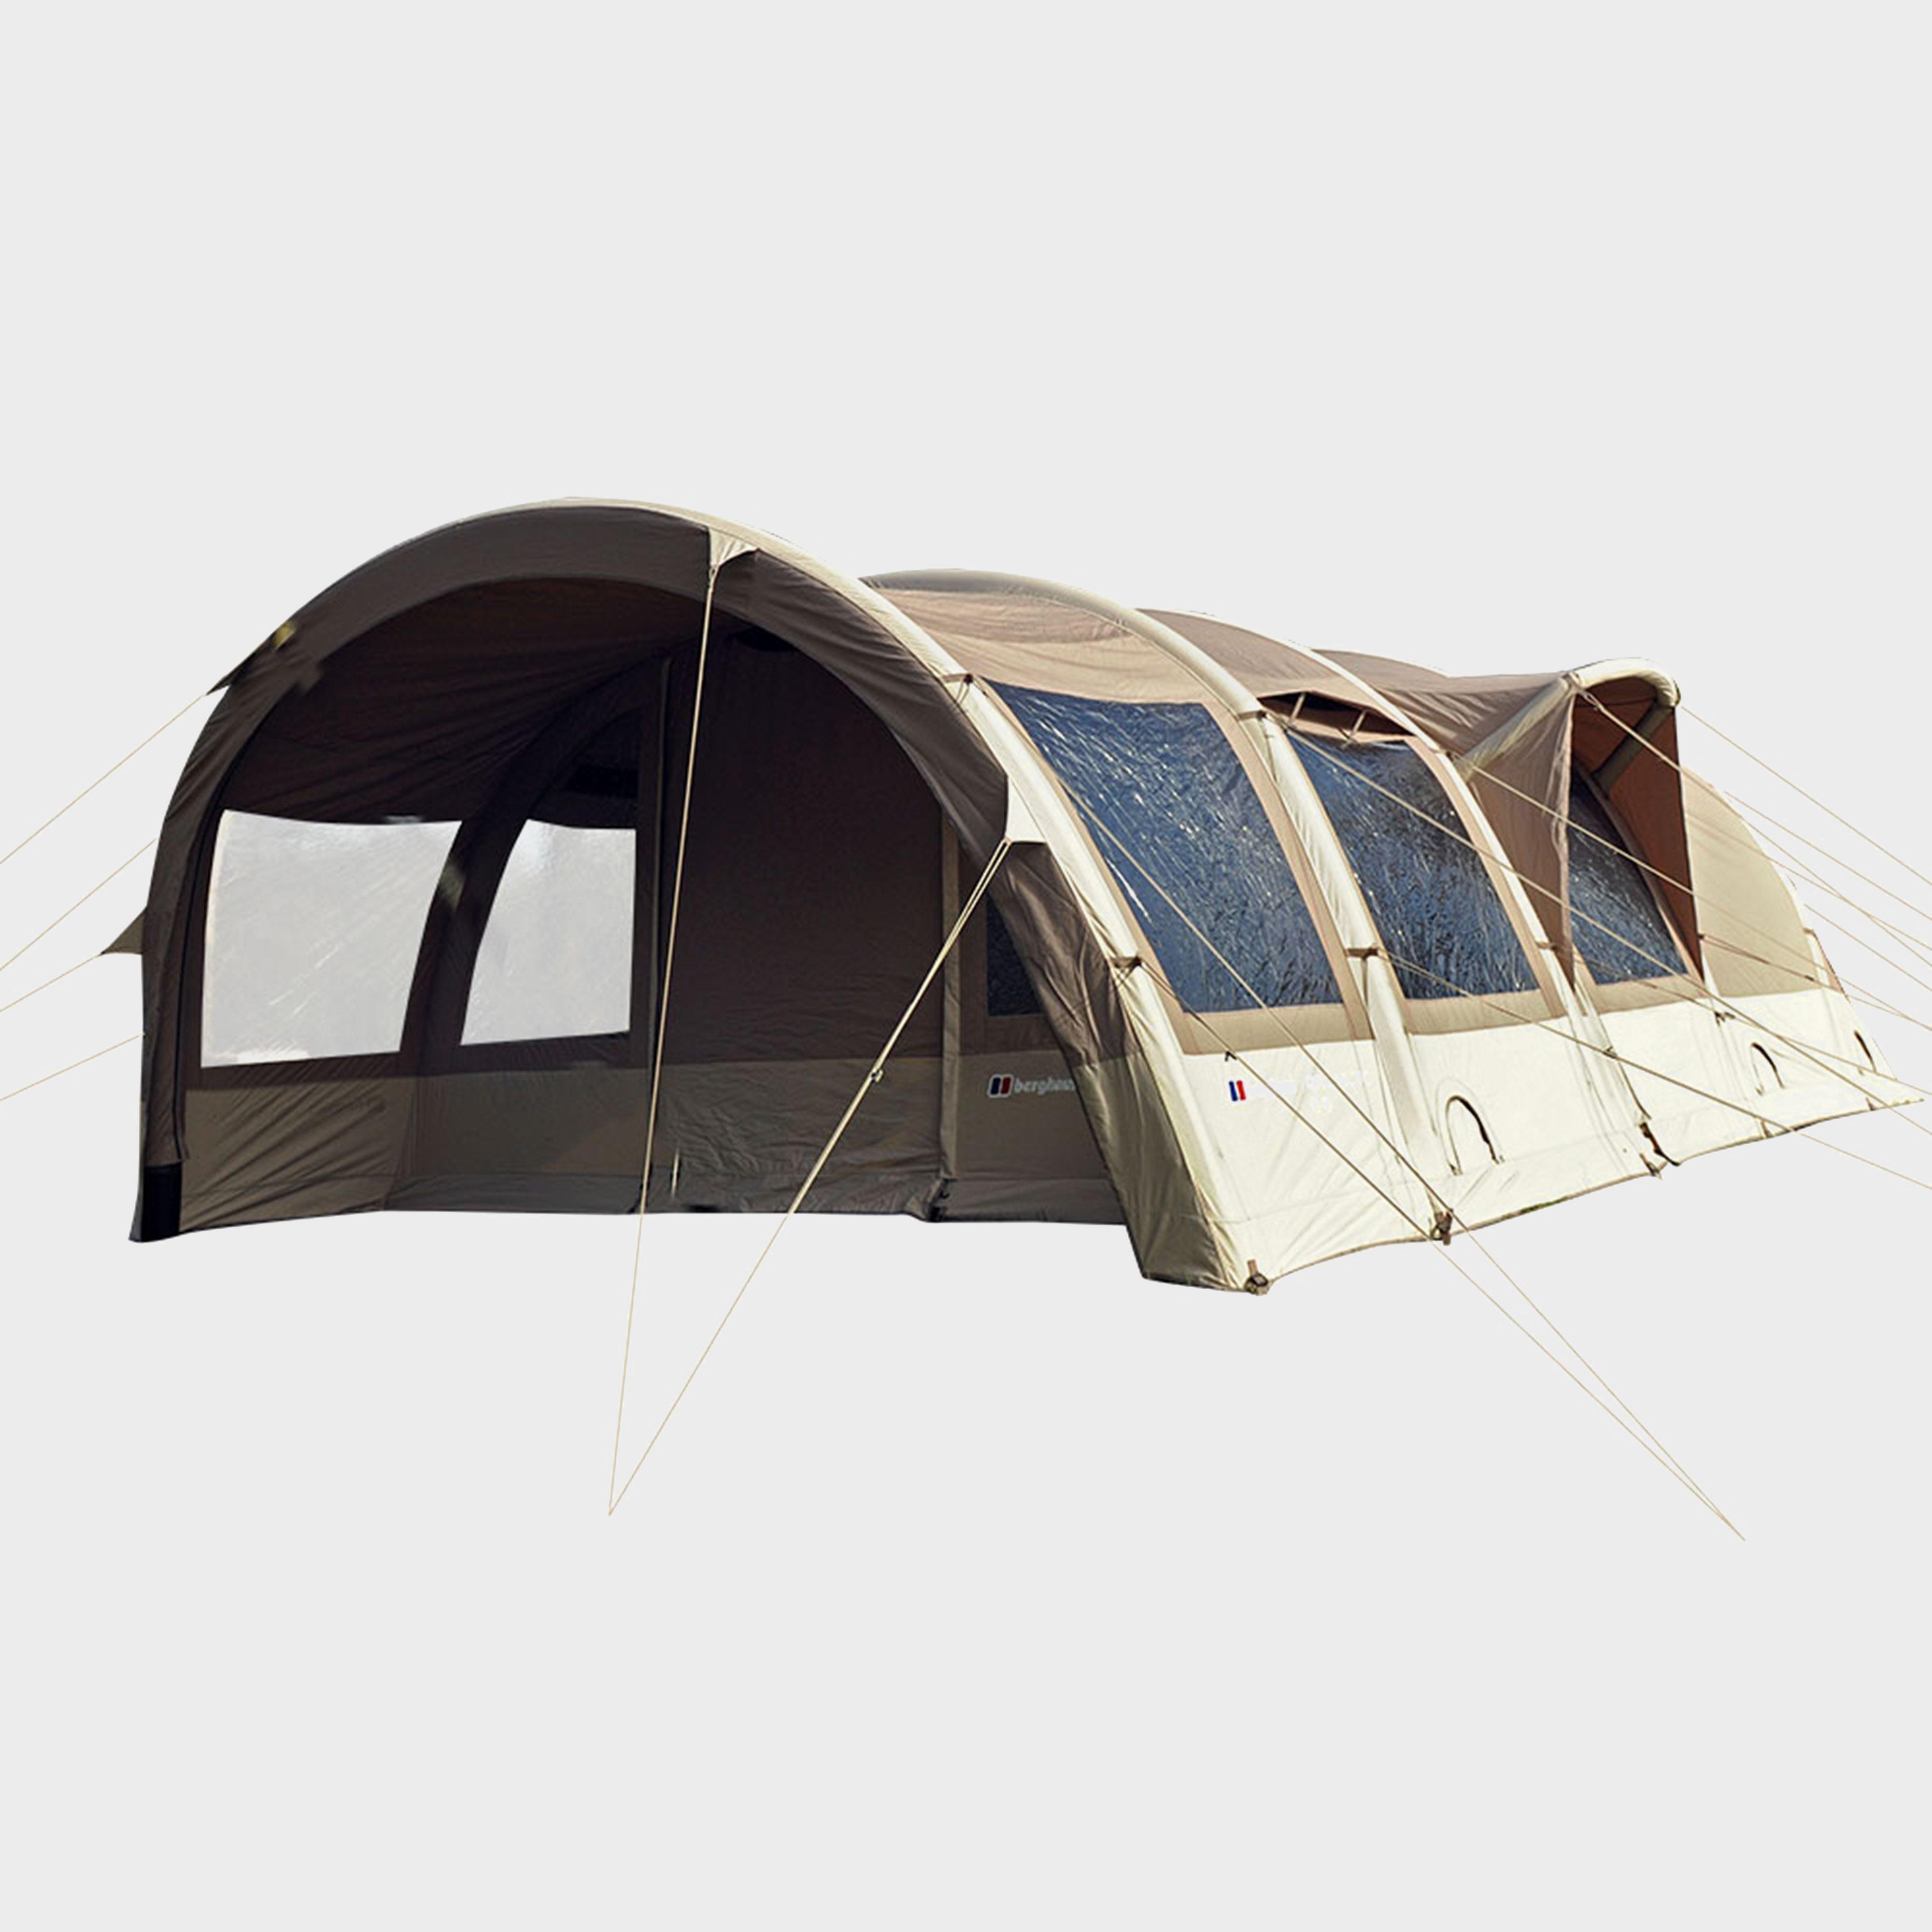 Berghaus Air 6 Xl Polycotton Family Tent - Bge/Bge, BGE/BGE